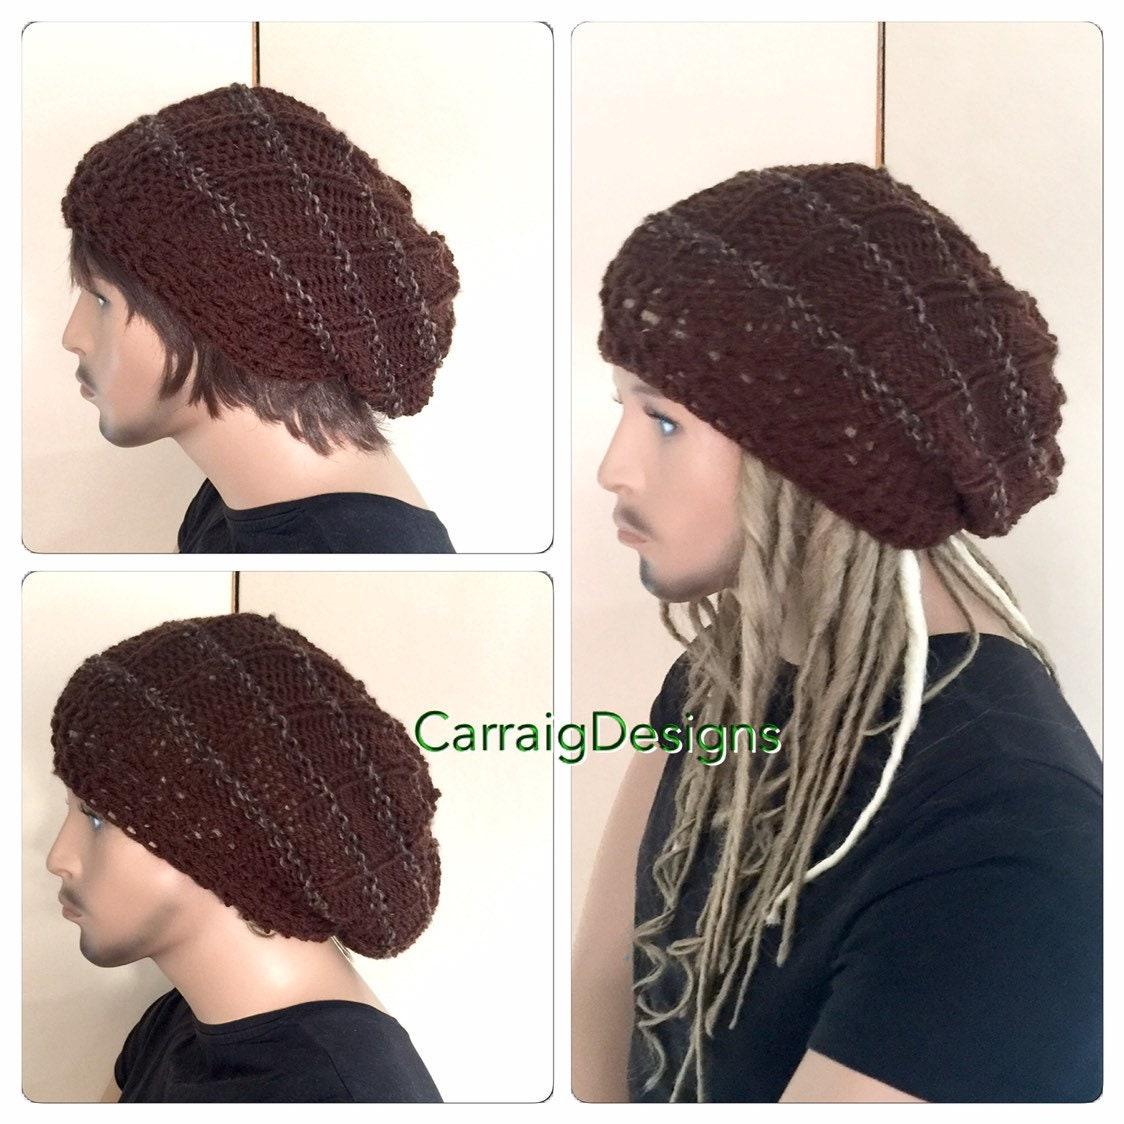 9bddc001c21 Unisex slouch Dread beanie Oversized hat mans mens unique guy hand crochet  knit gift tam accessories hippy handmade dreadlocks irish brown